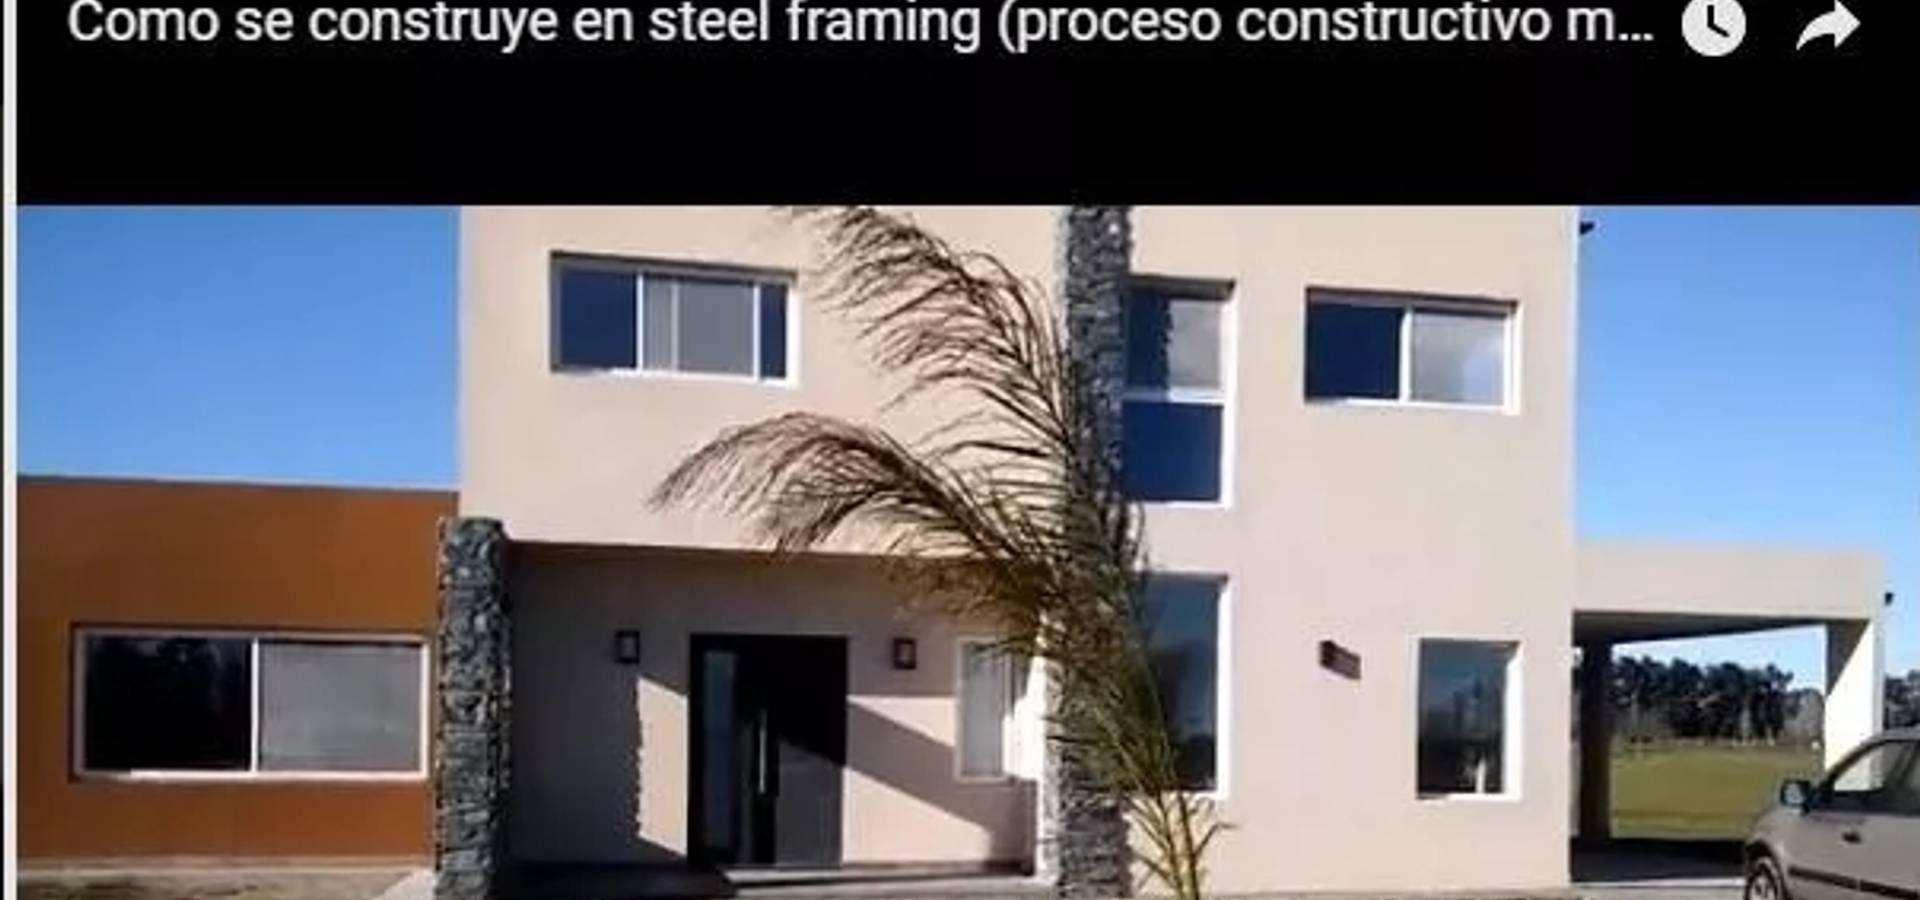 M&A Ingenieria ecosustentable